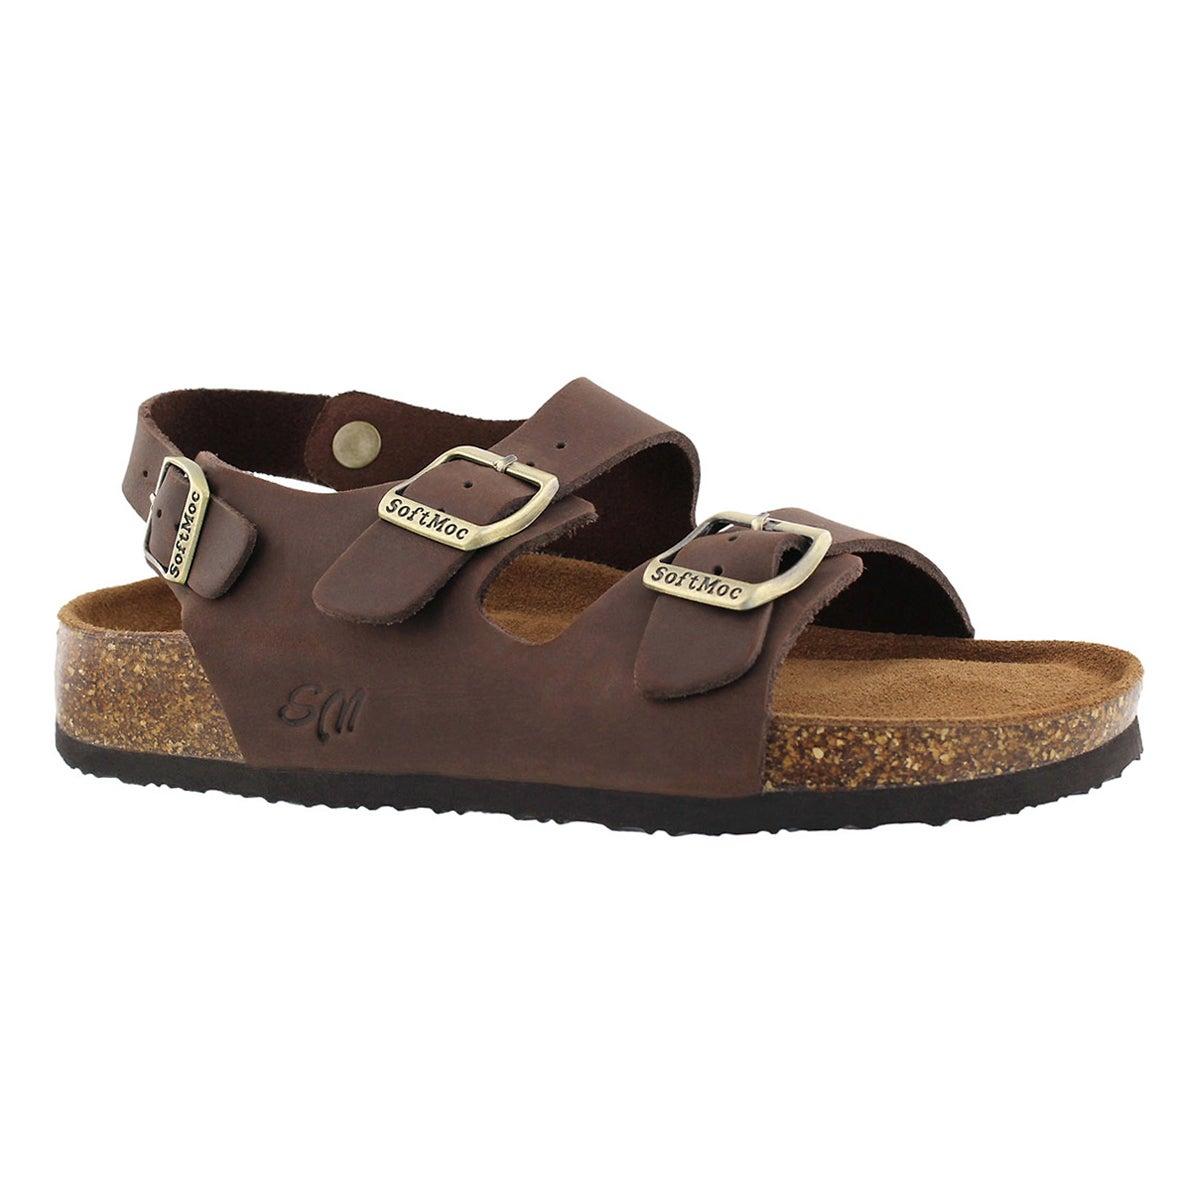 Women's ANIKA 5 brown memory foam sandals